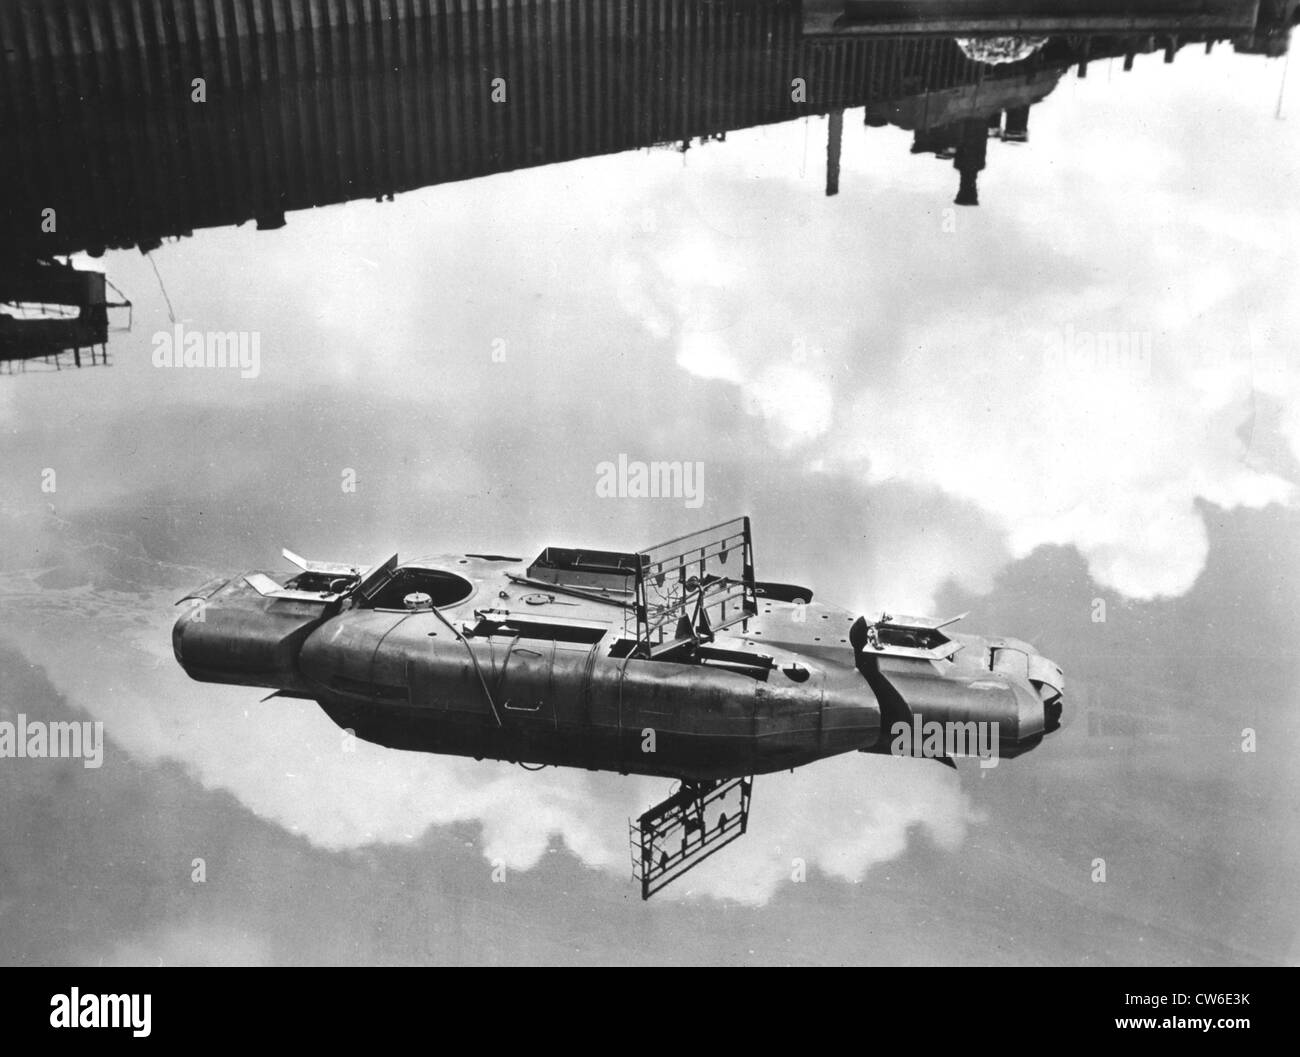 A German U-boat sunk in Bremen, April 27, 1945 - Stock Image